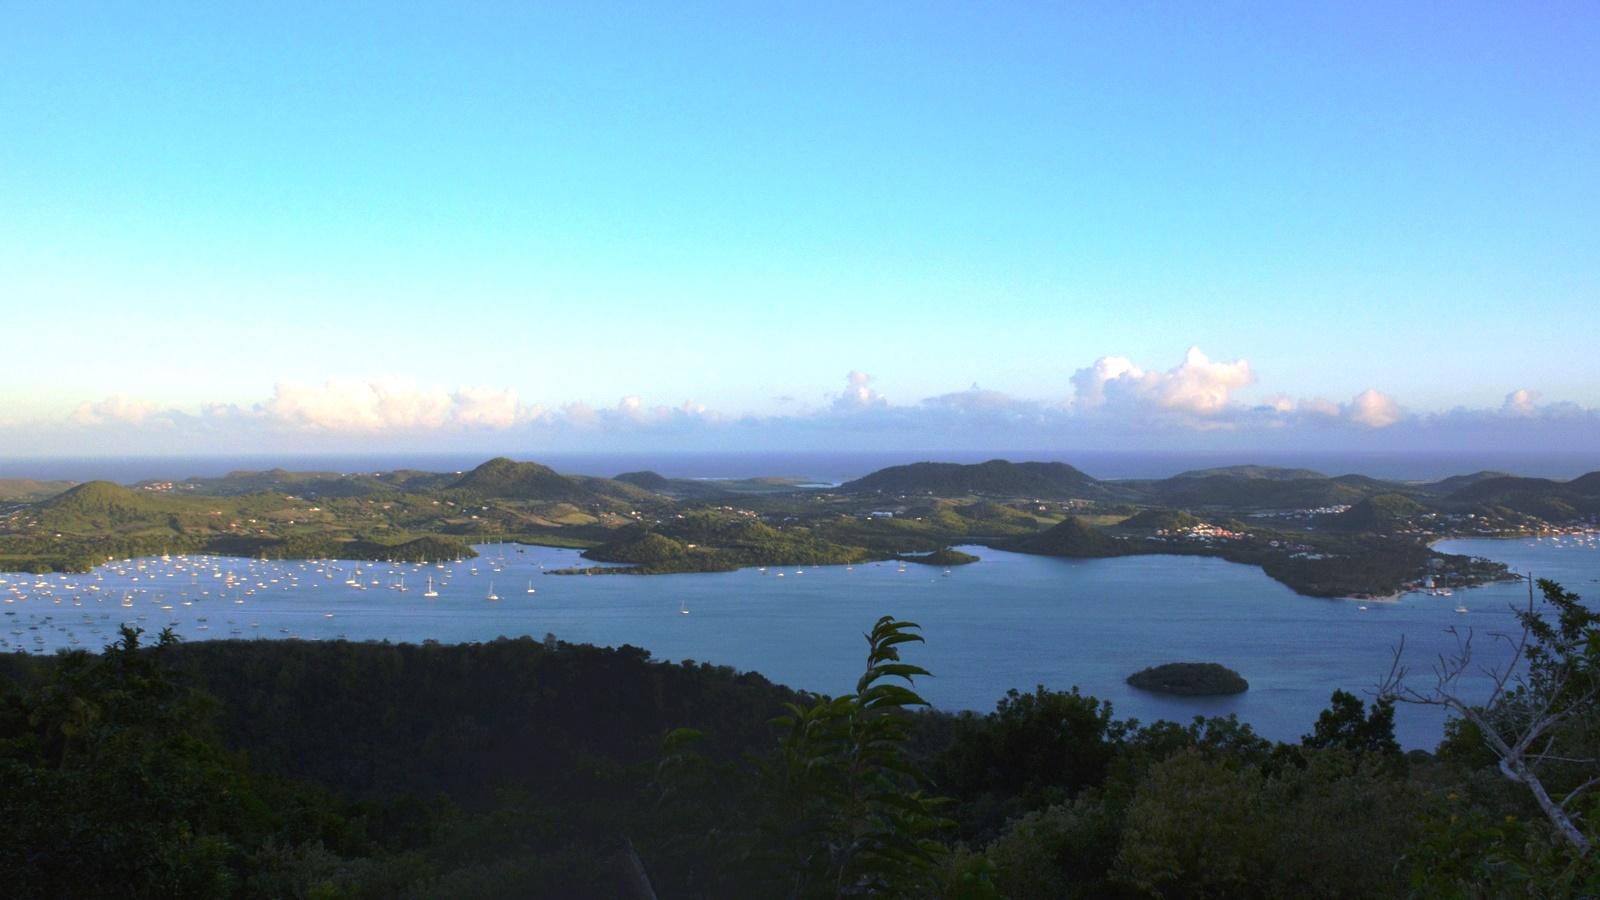 Vue de la baie du Marin et sa marina - Martinique